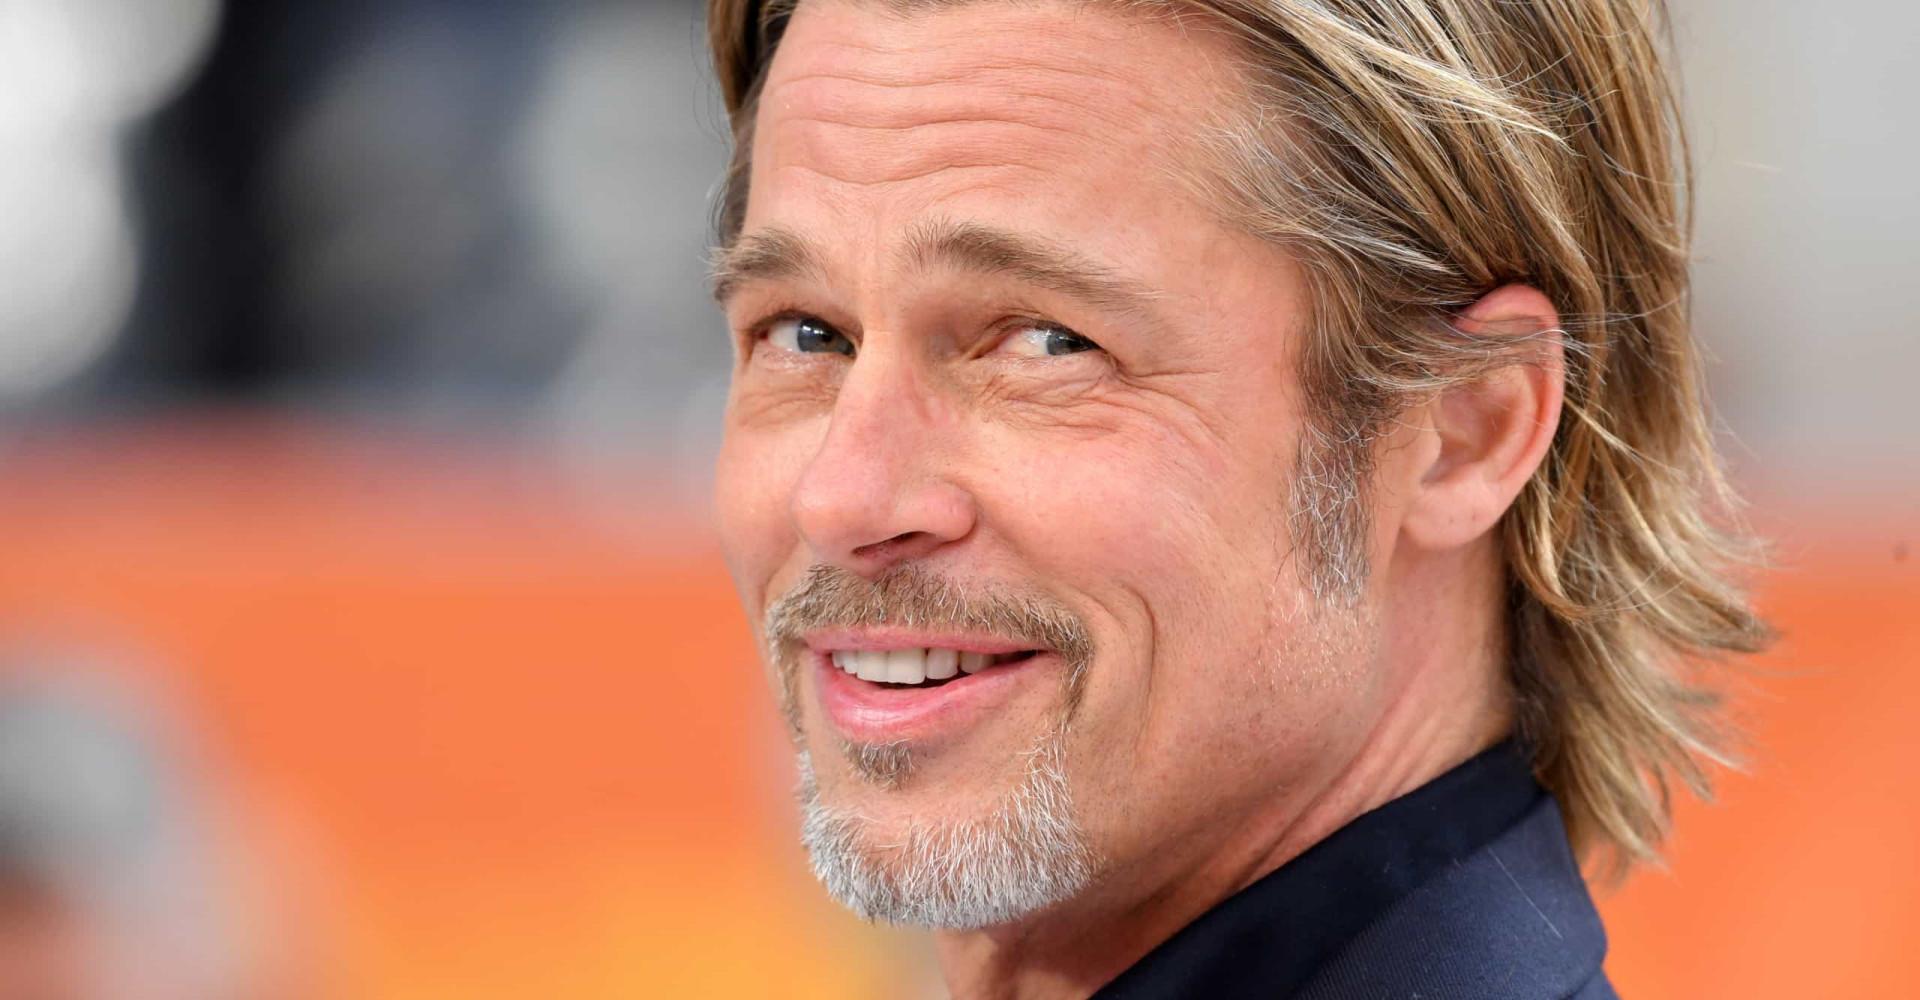 All the famous women Brad Pitt has romanced